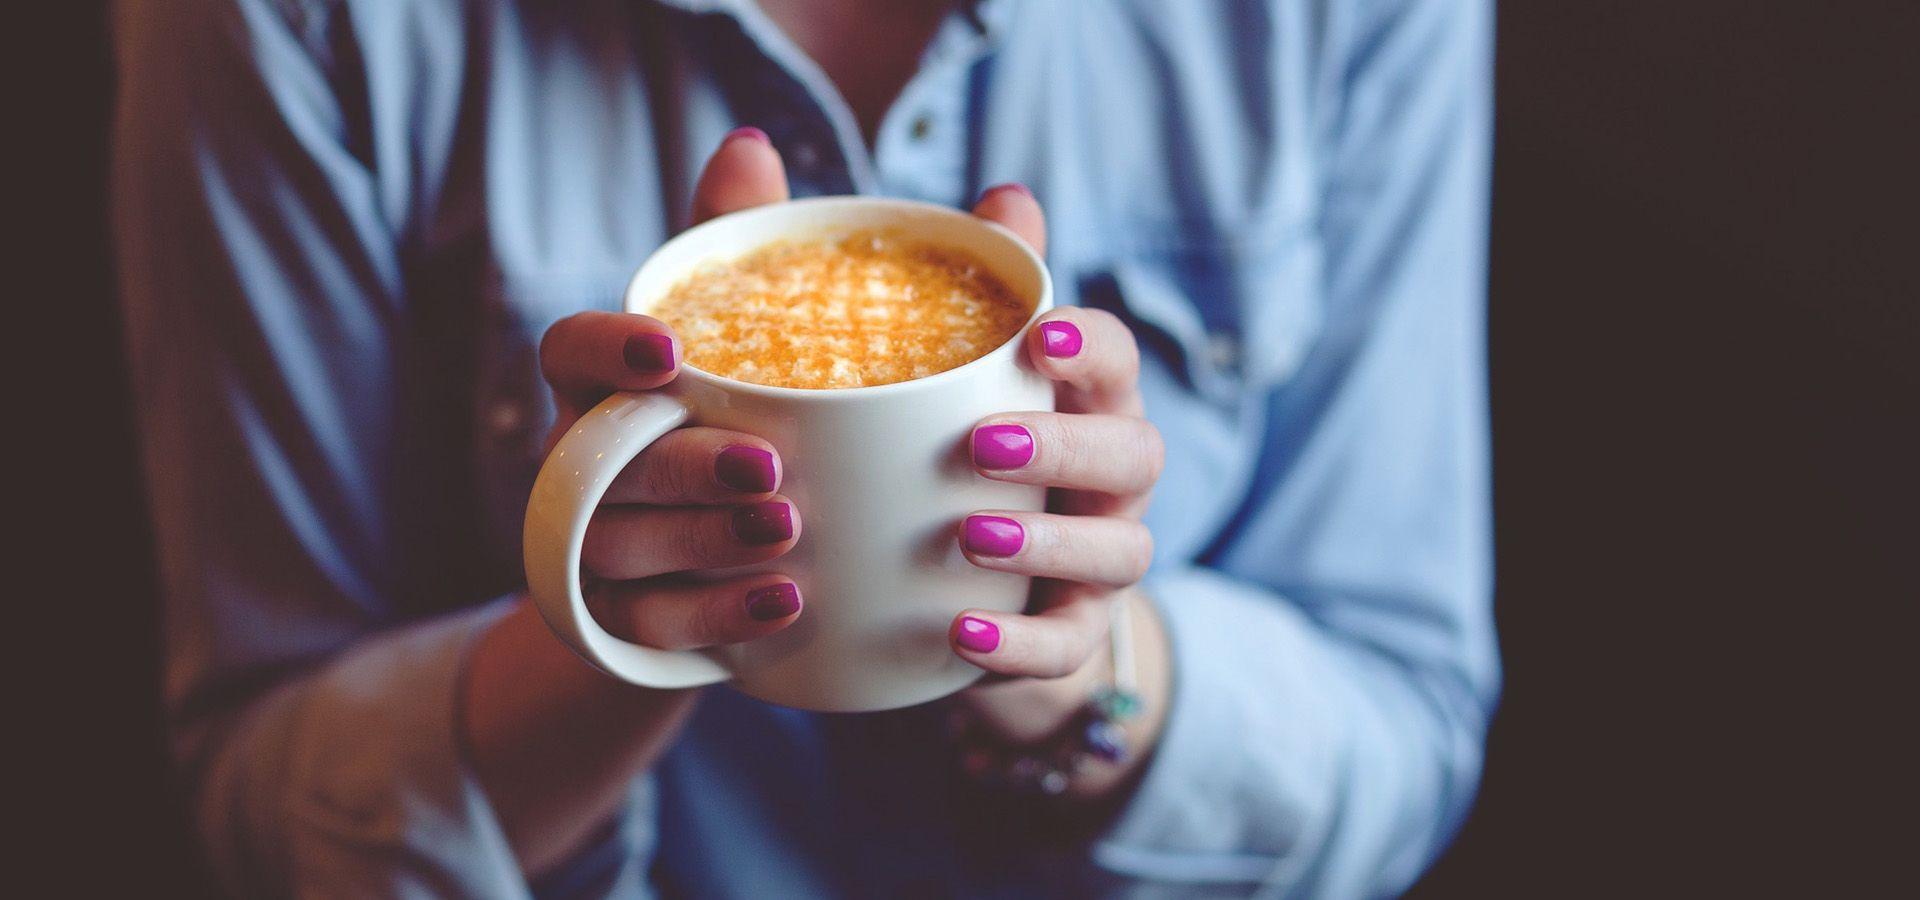 Be caffeine smart